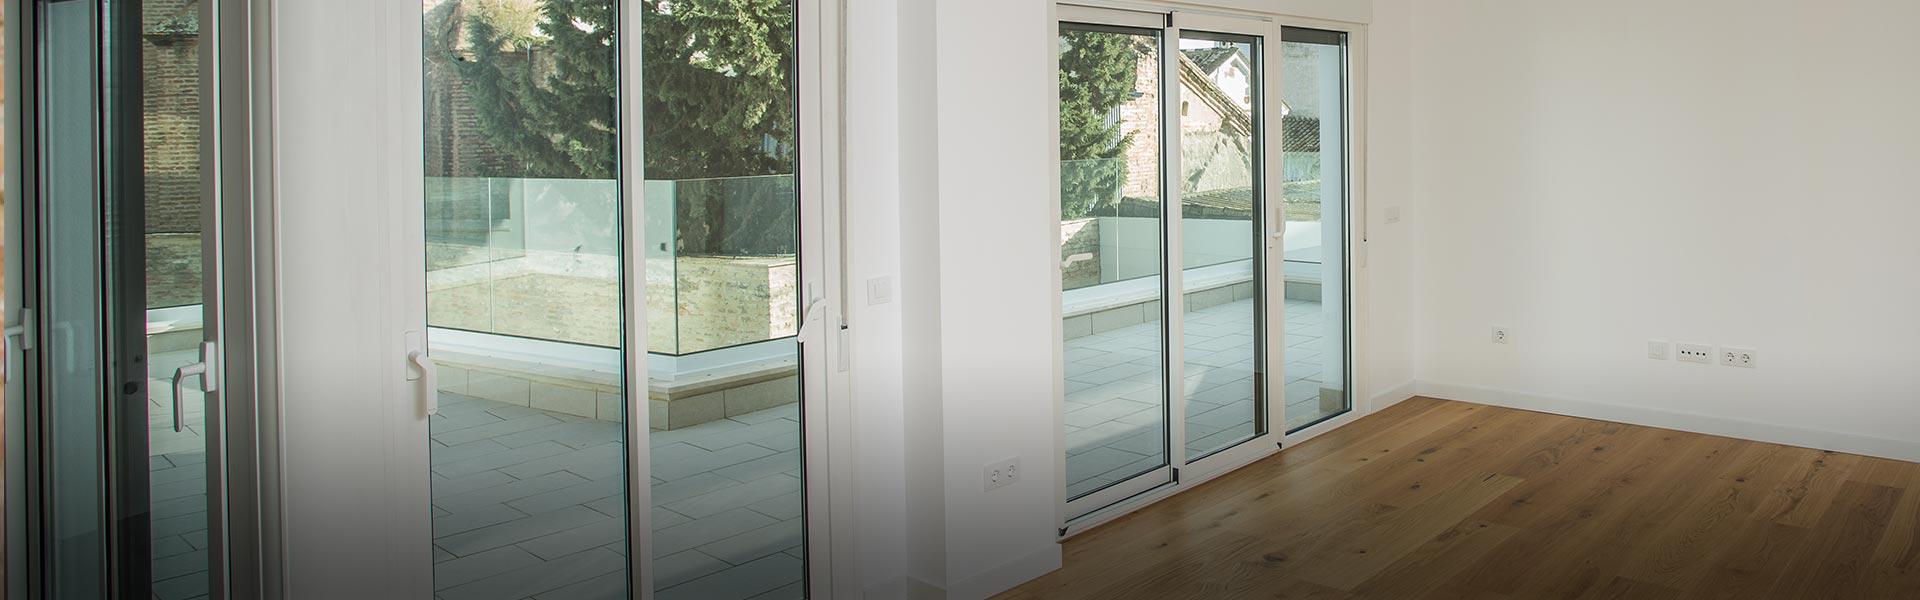 Viviendas personalizadas con terraza en Santa Clara - Sevilla Centro